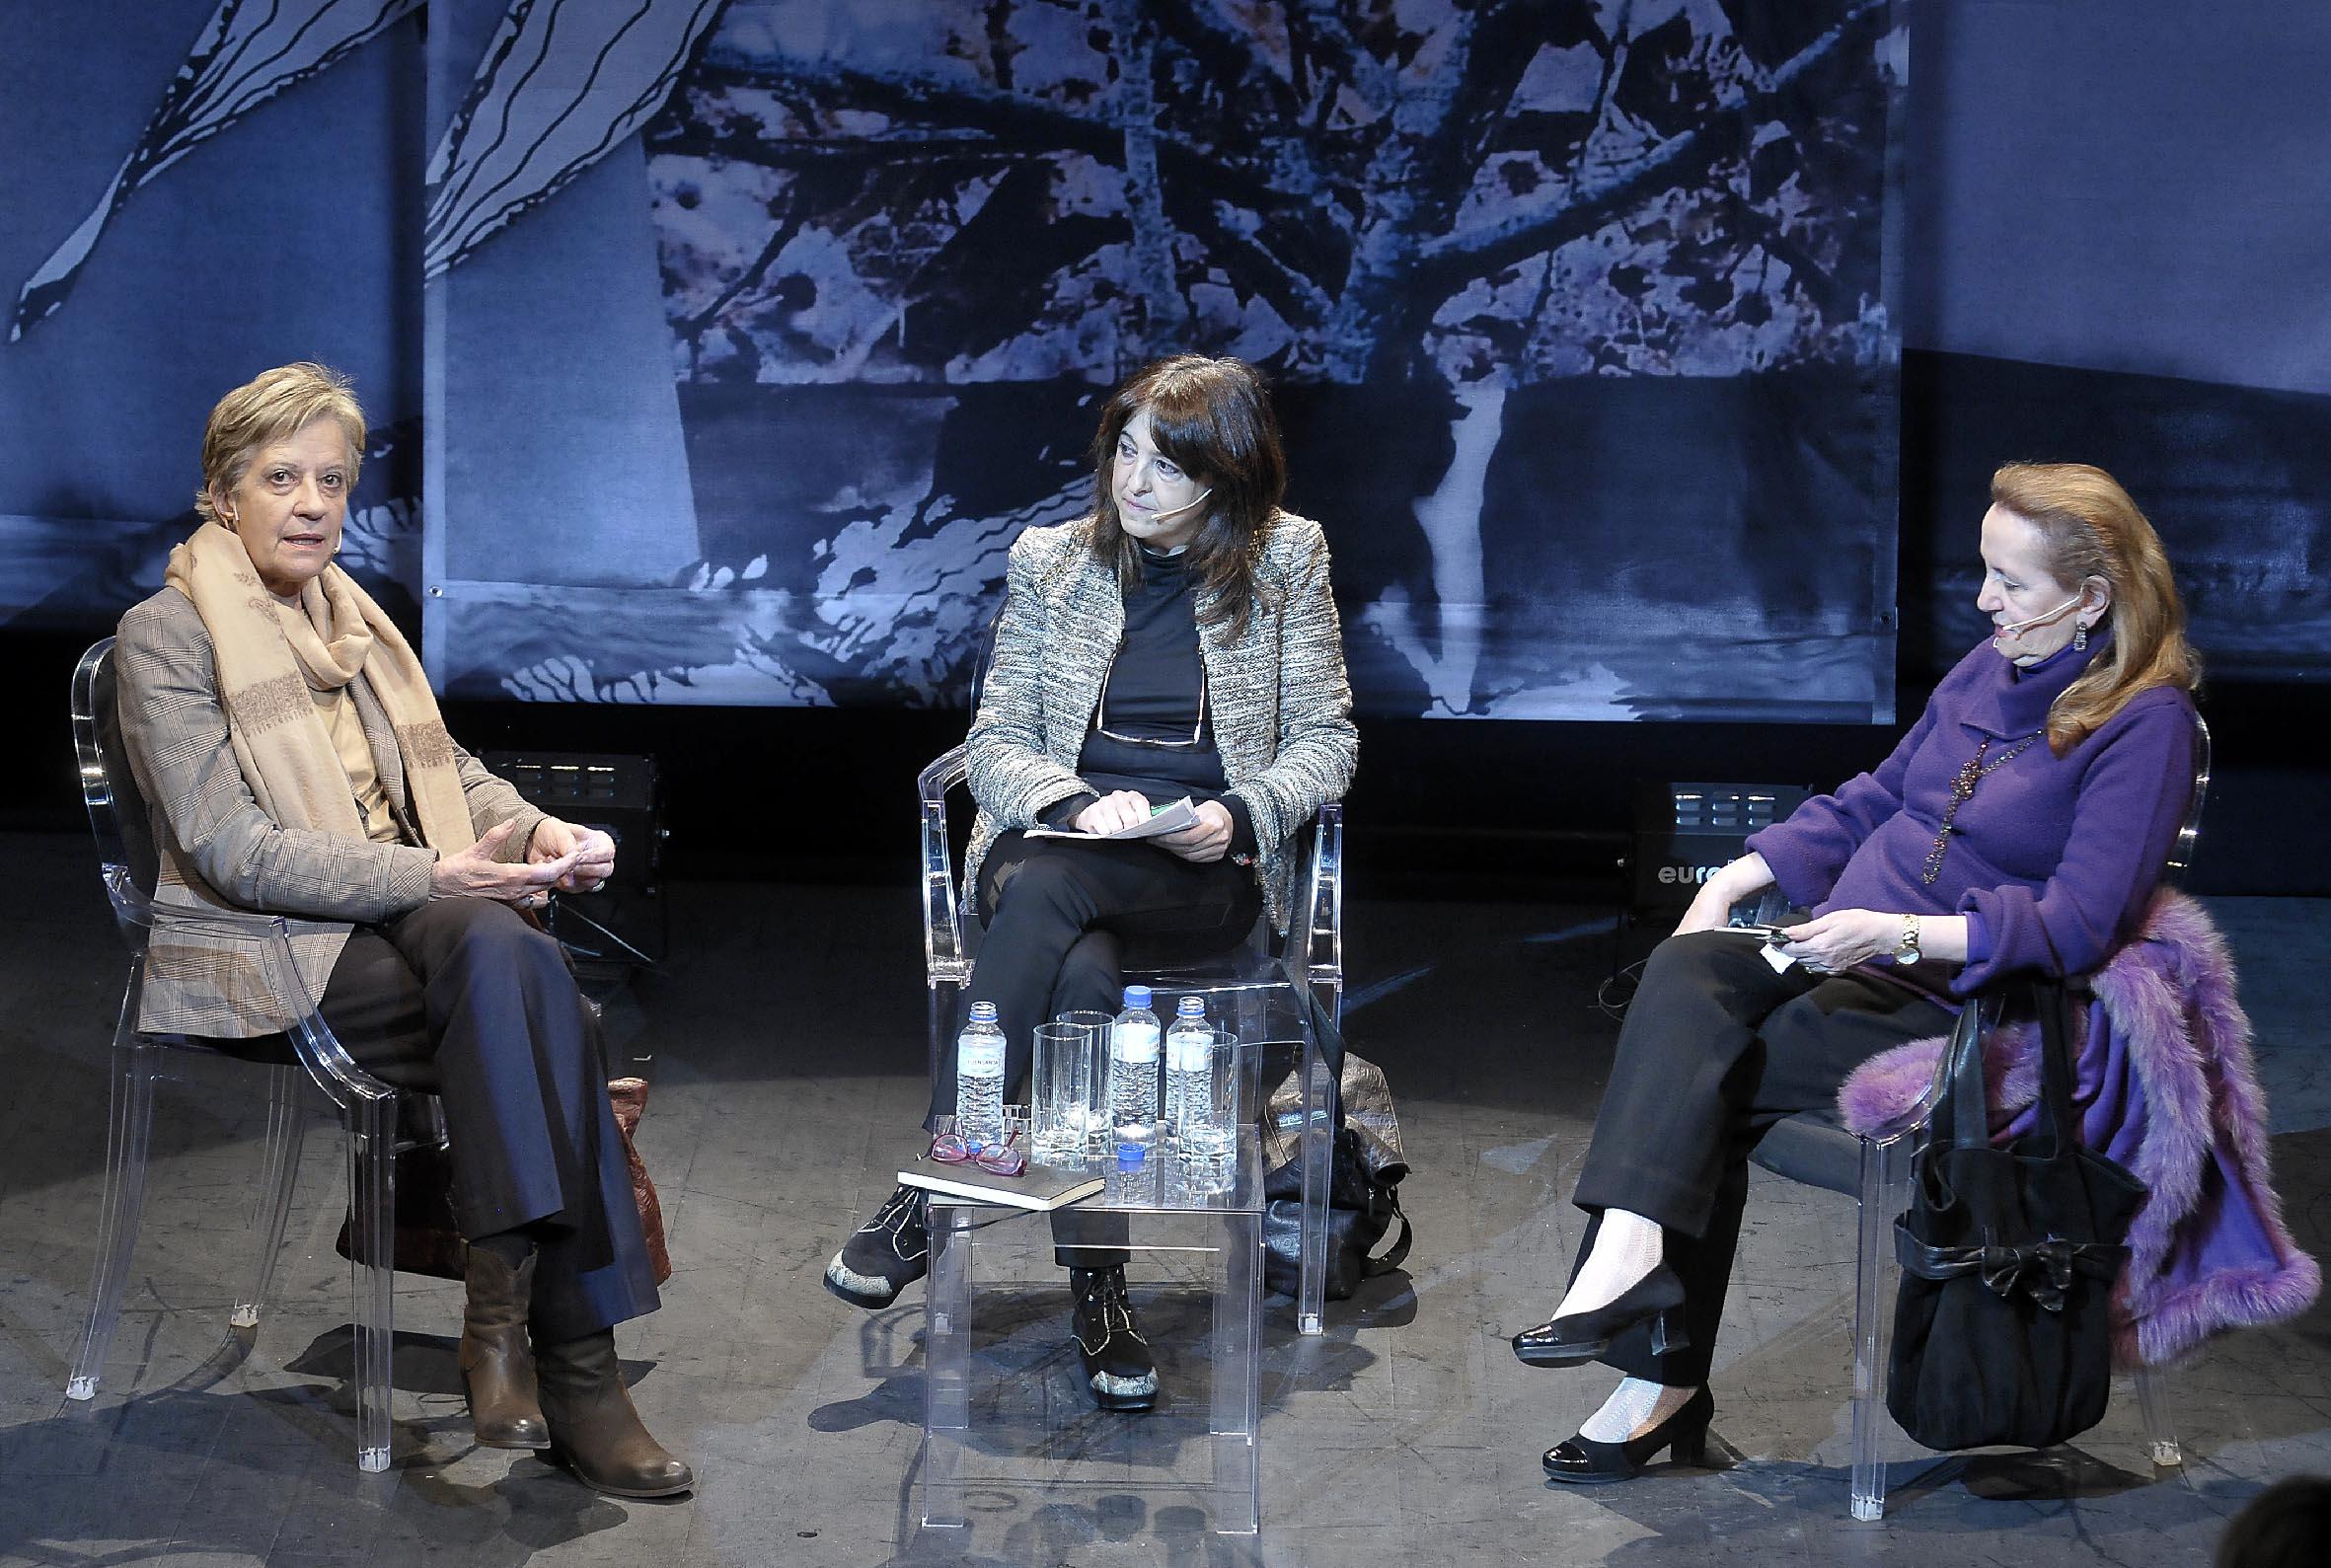 De izd a dcha, Victoria Camps, Angelica Tanarro y Amelia Valcarcel